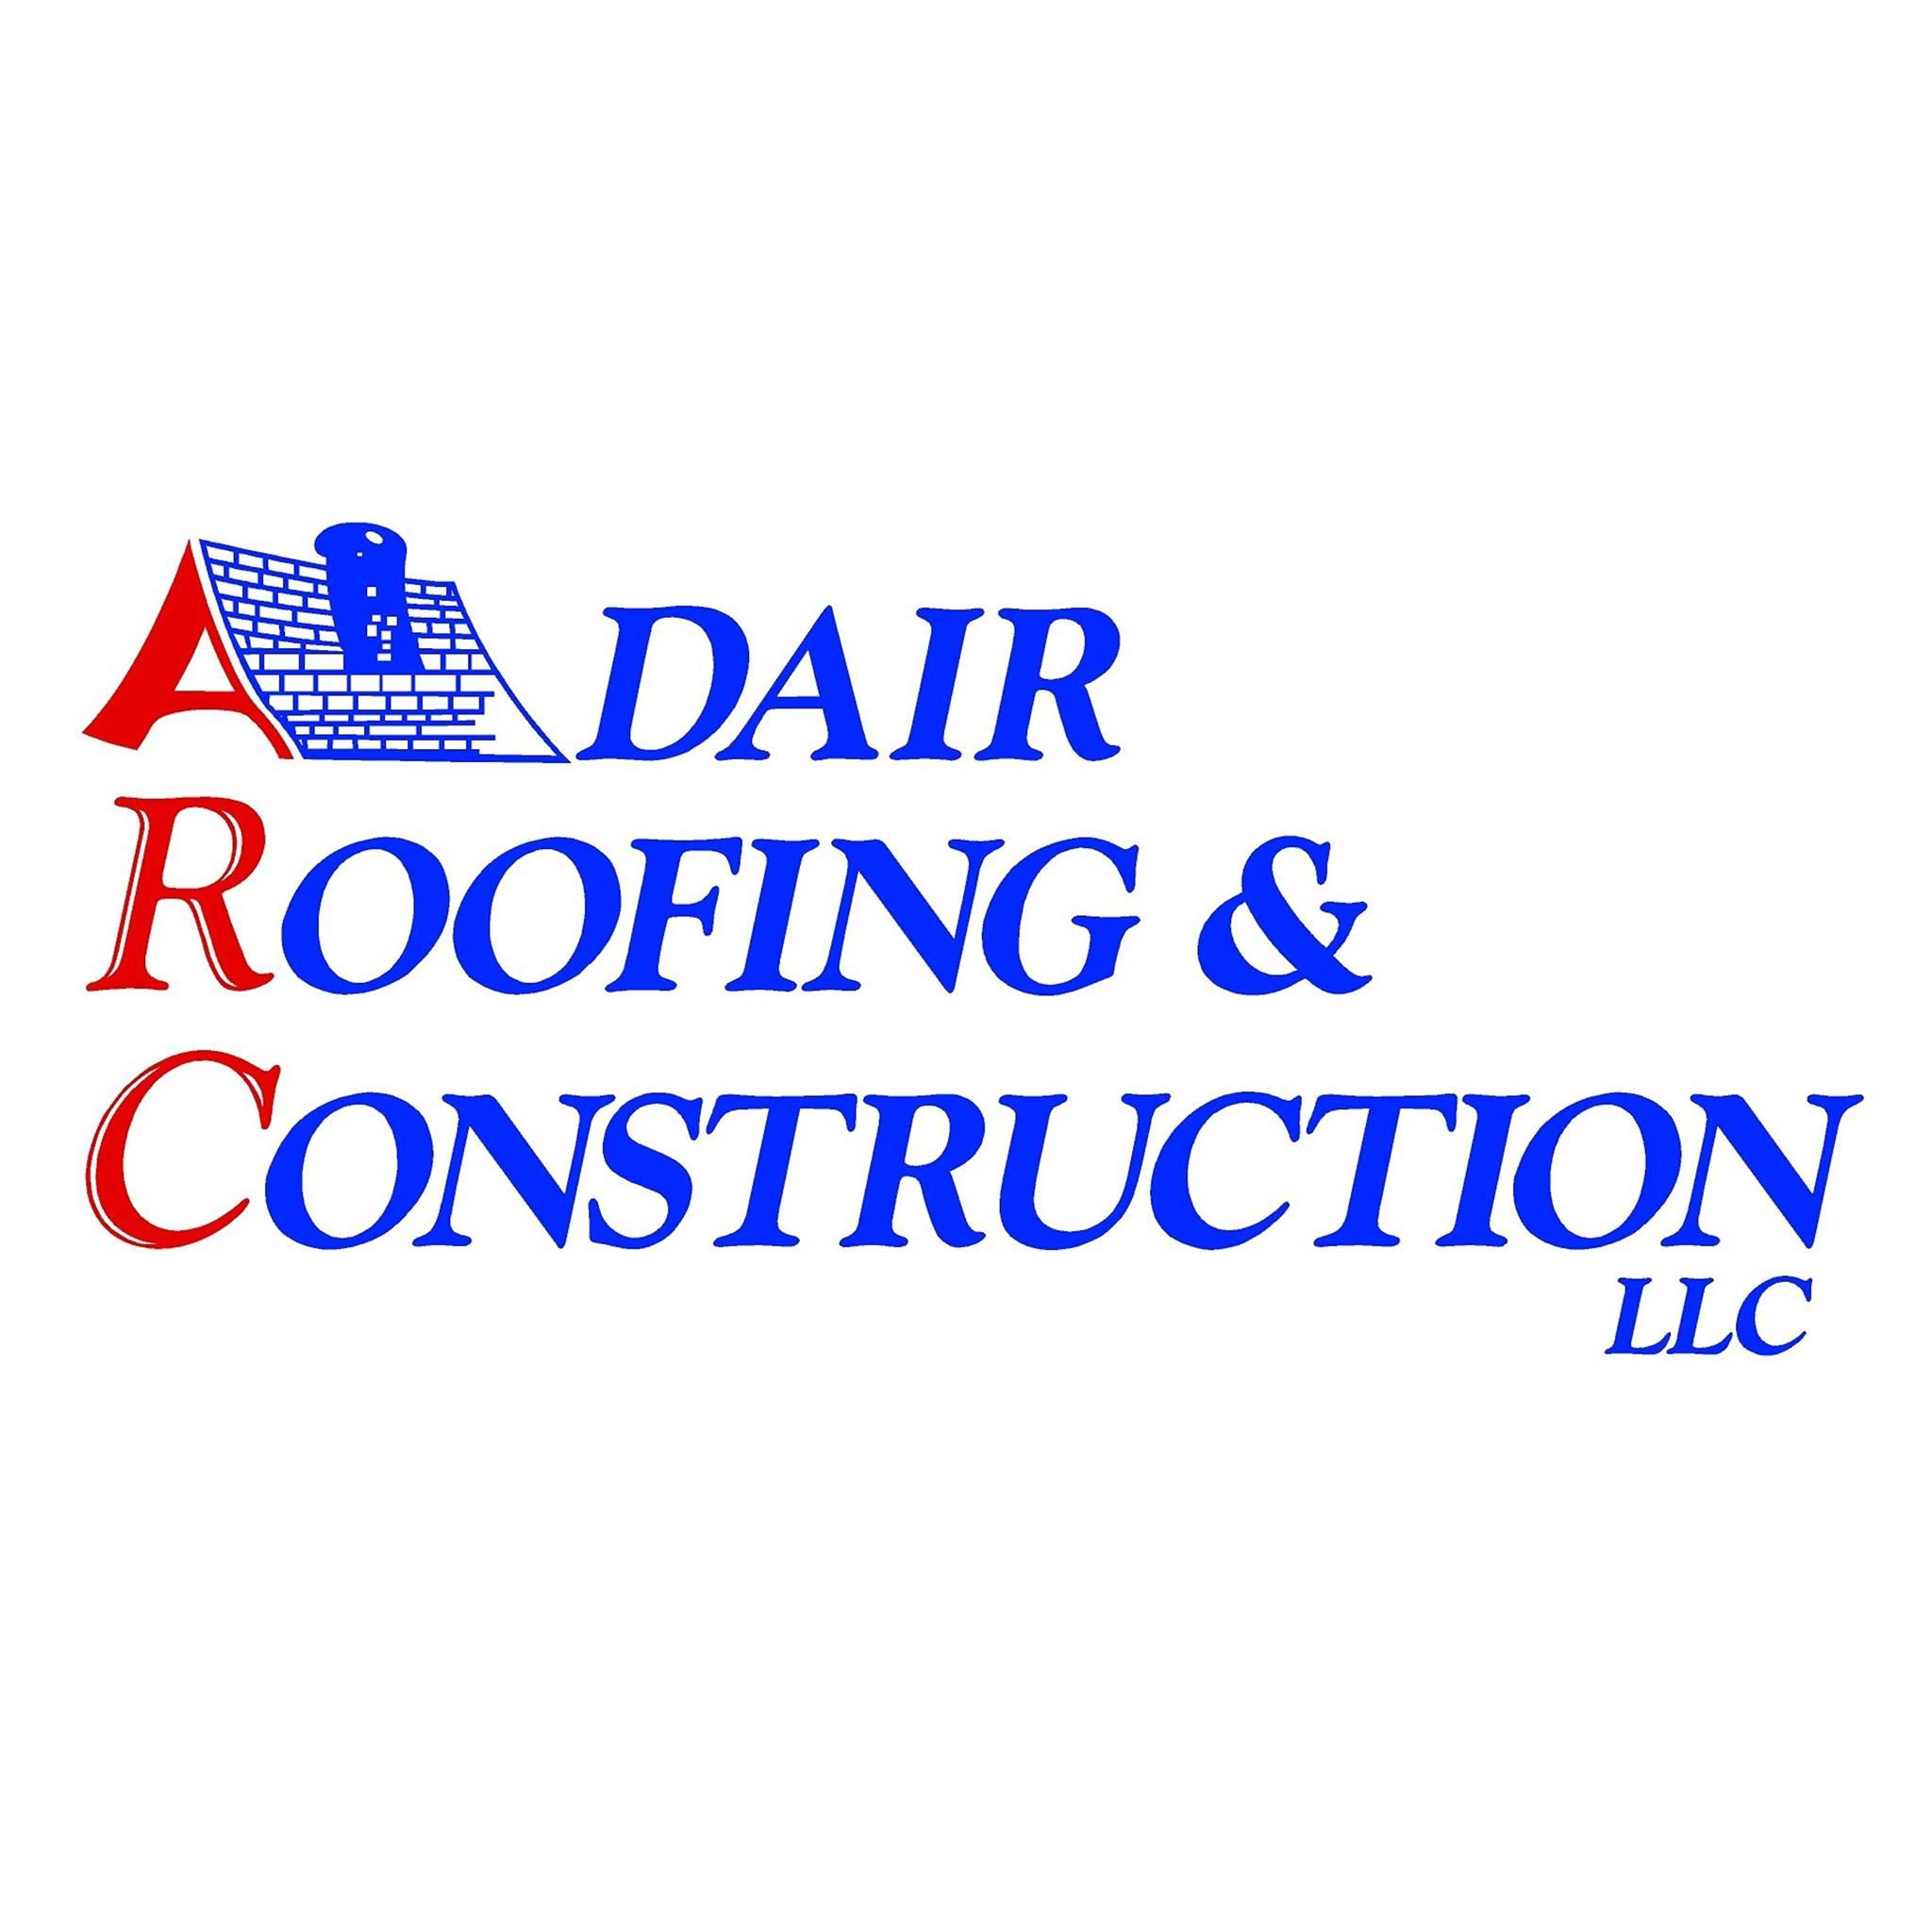 Adair Roofing & Construction-logo